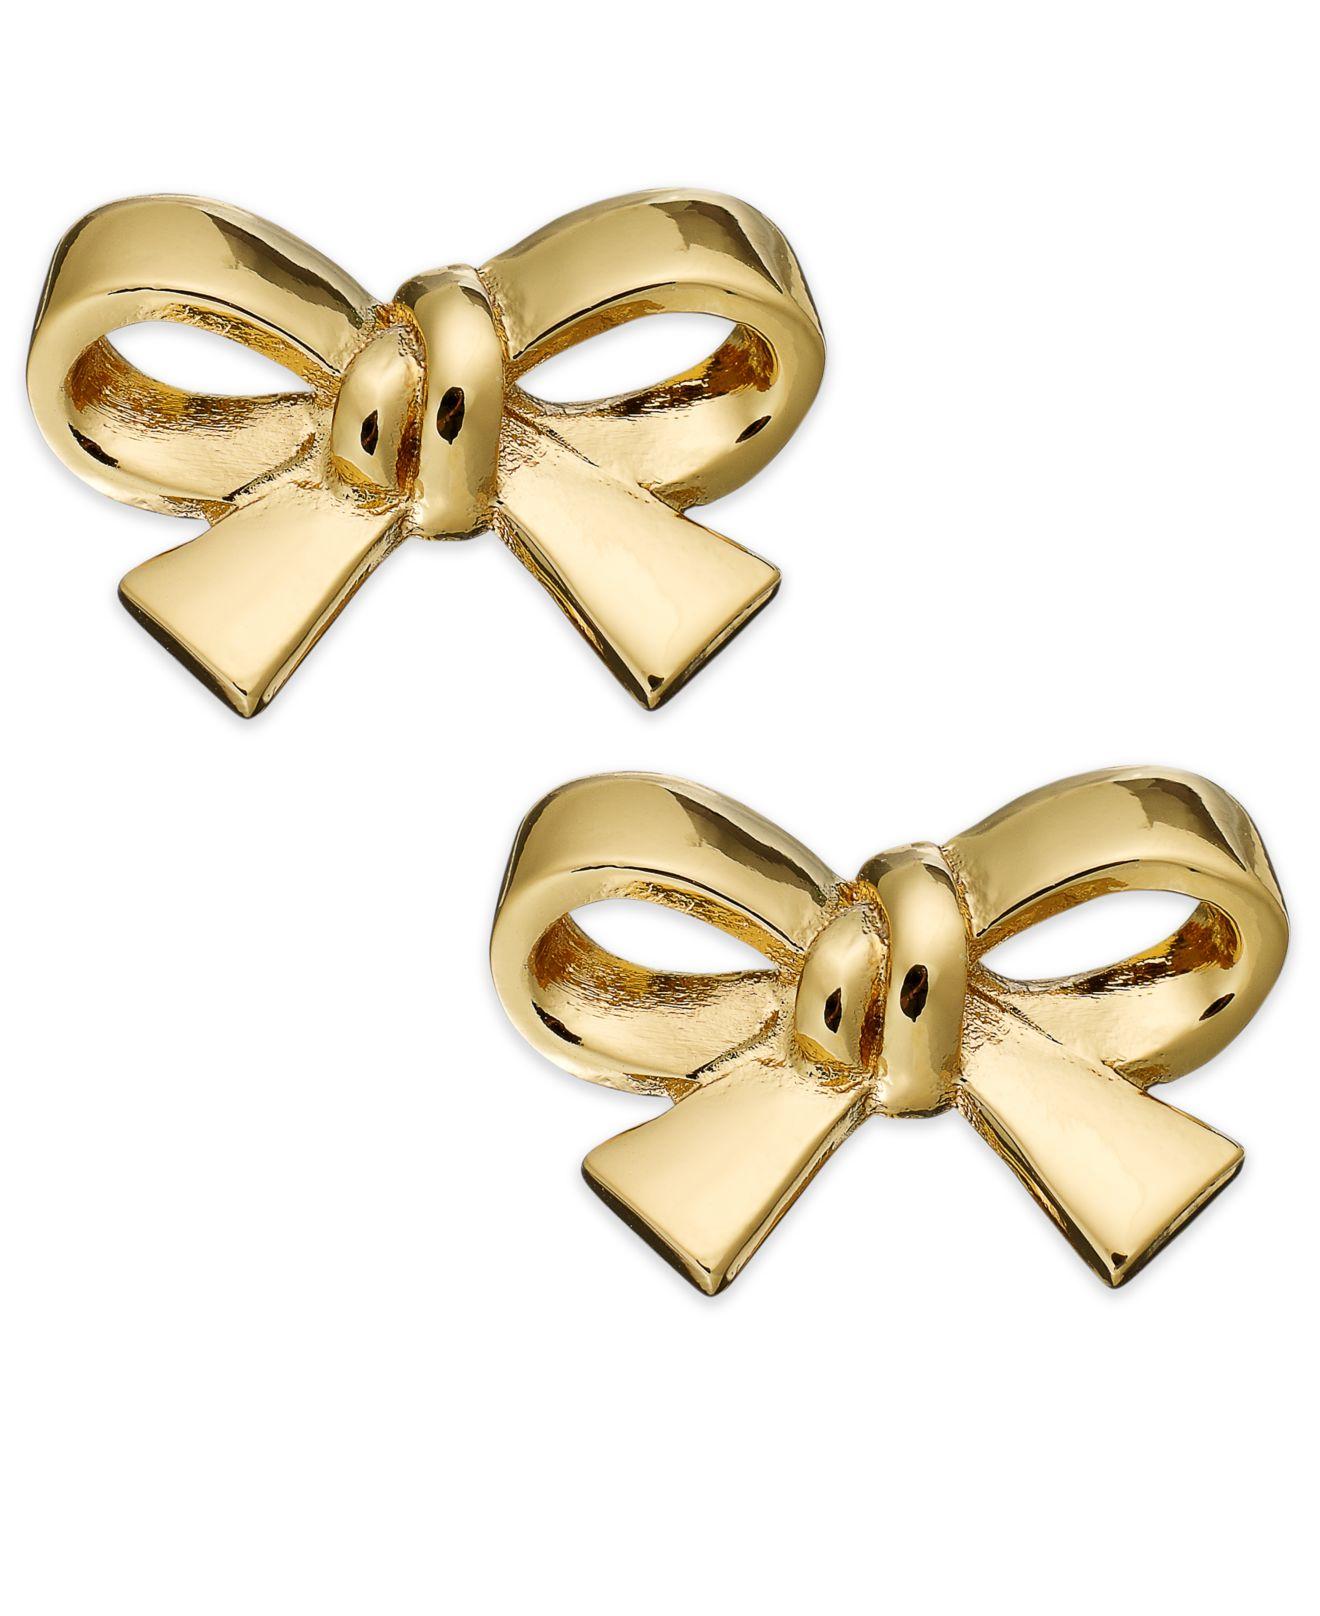 Lyst Kate Spade Gold Tone Bow Clip On Earrings In Metallic